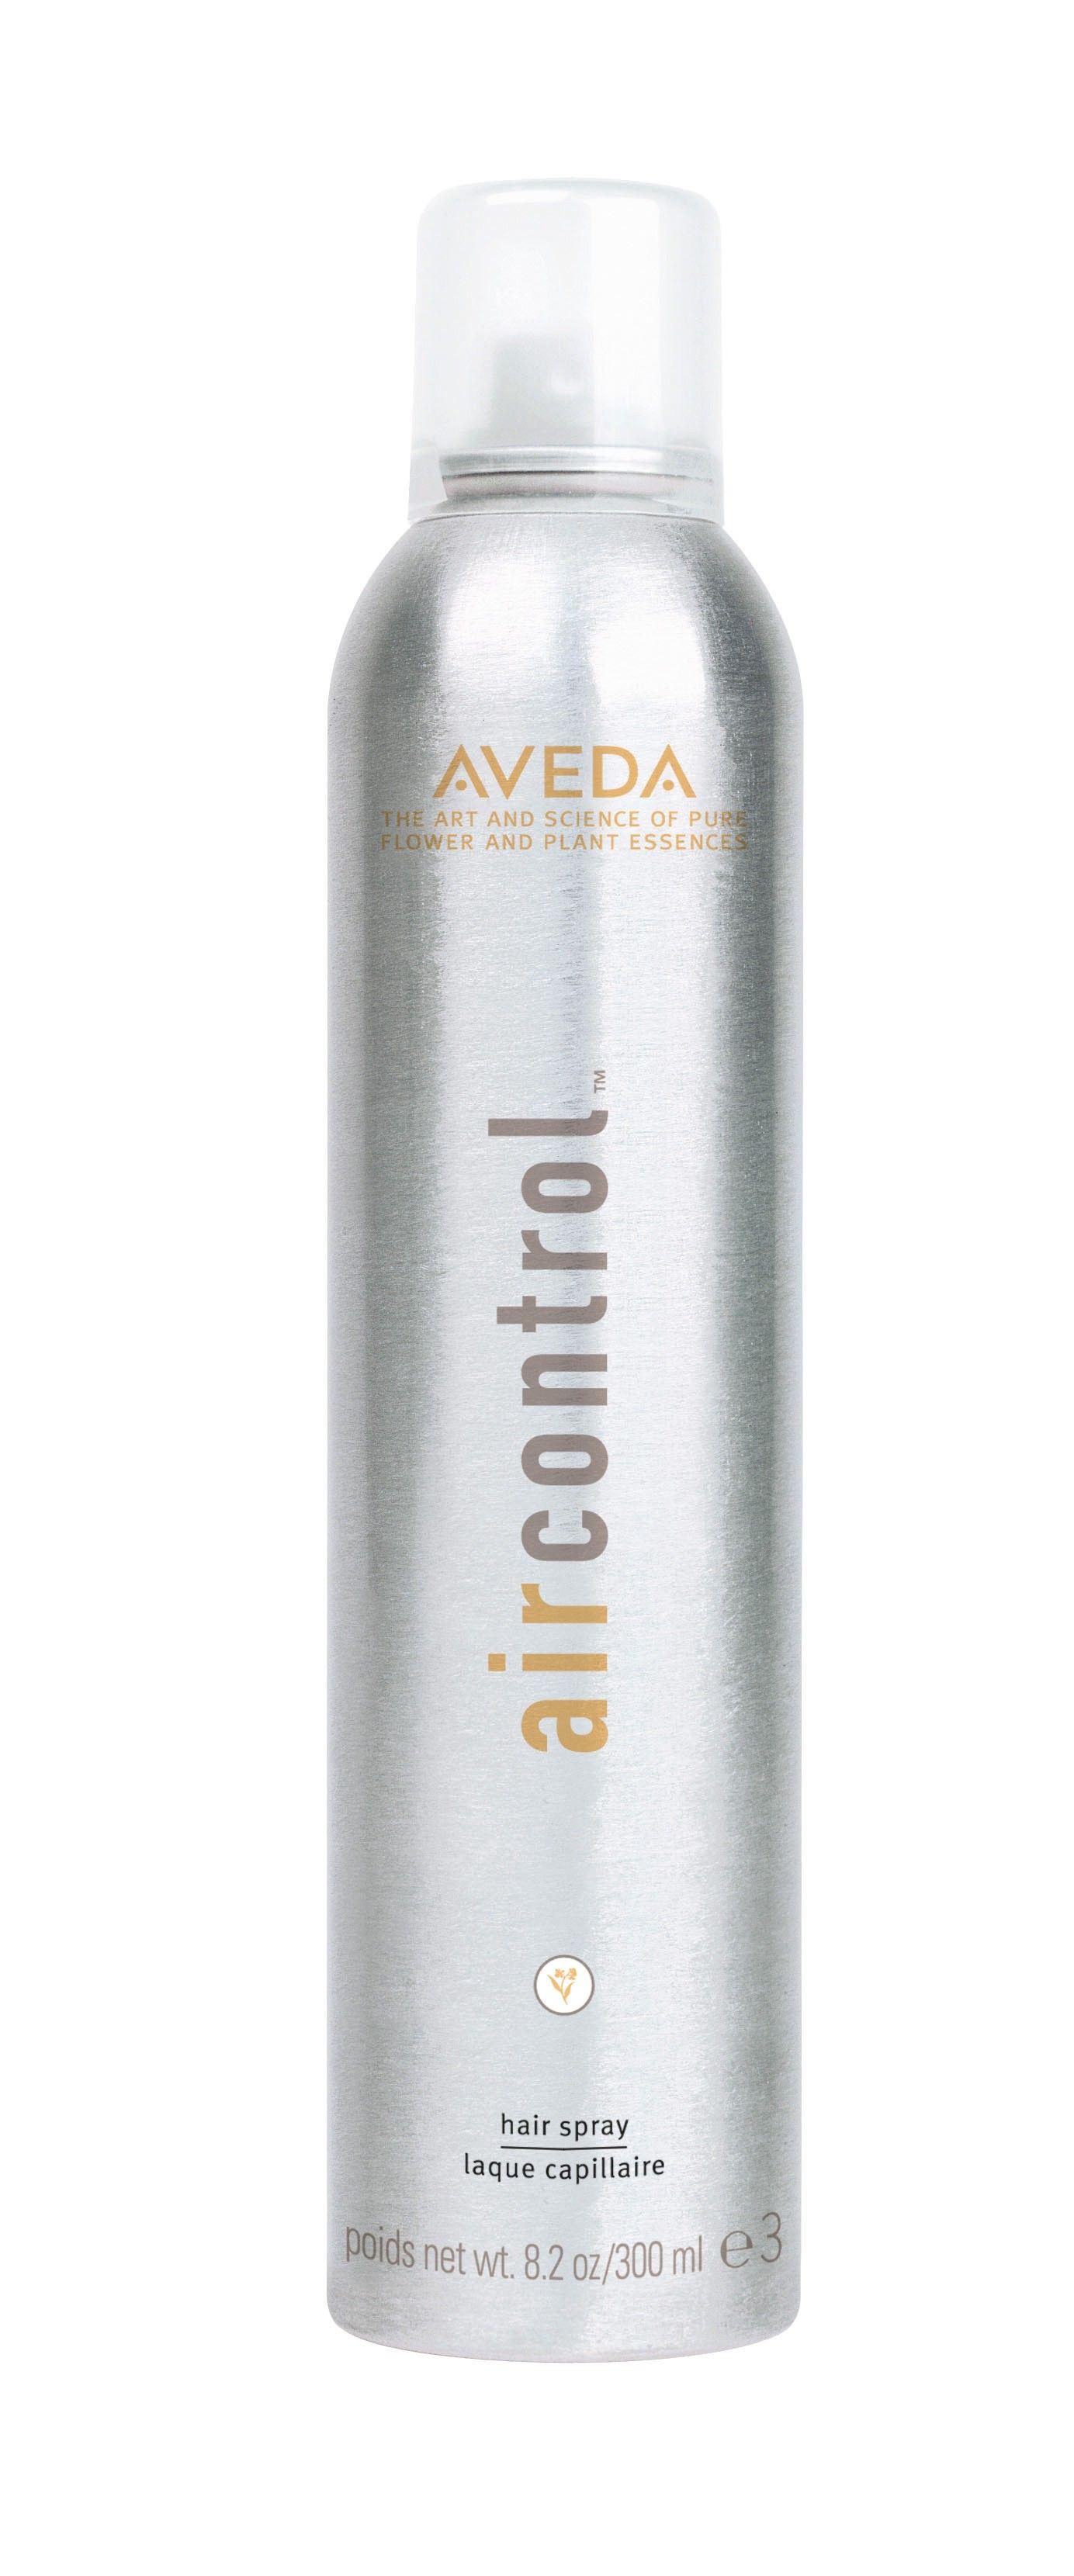 Aveda Air Control Hair Spray smells great, light hair